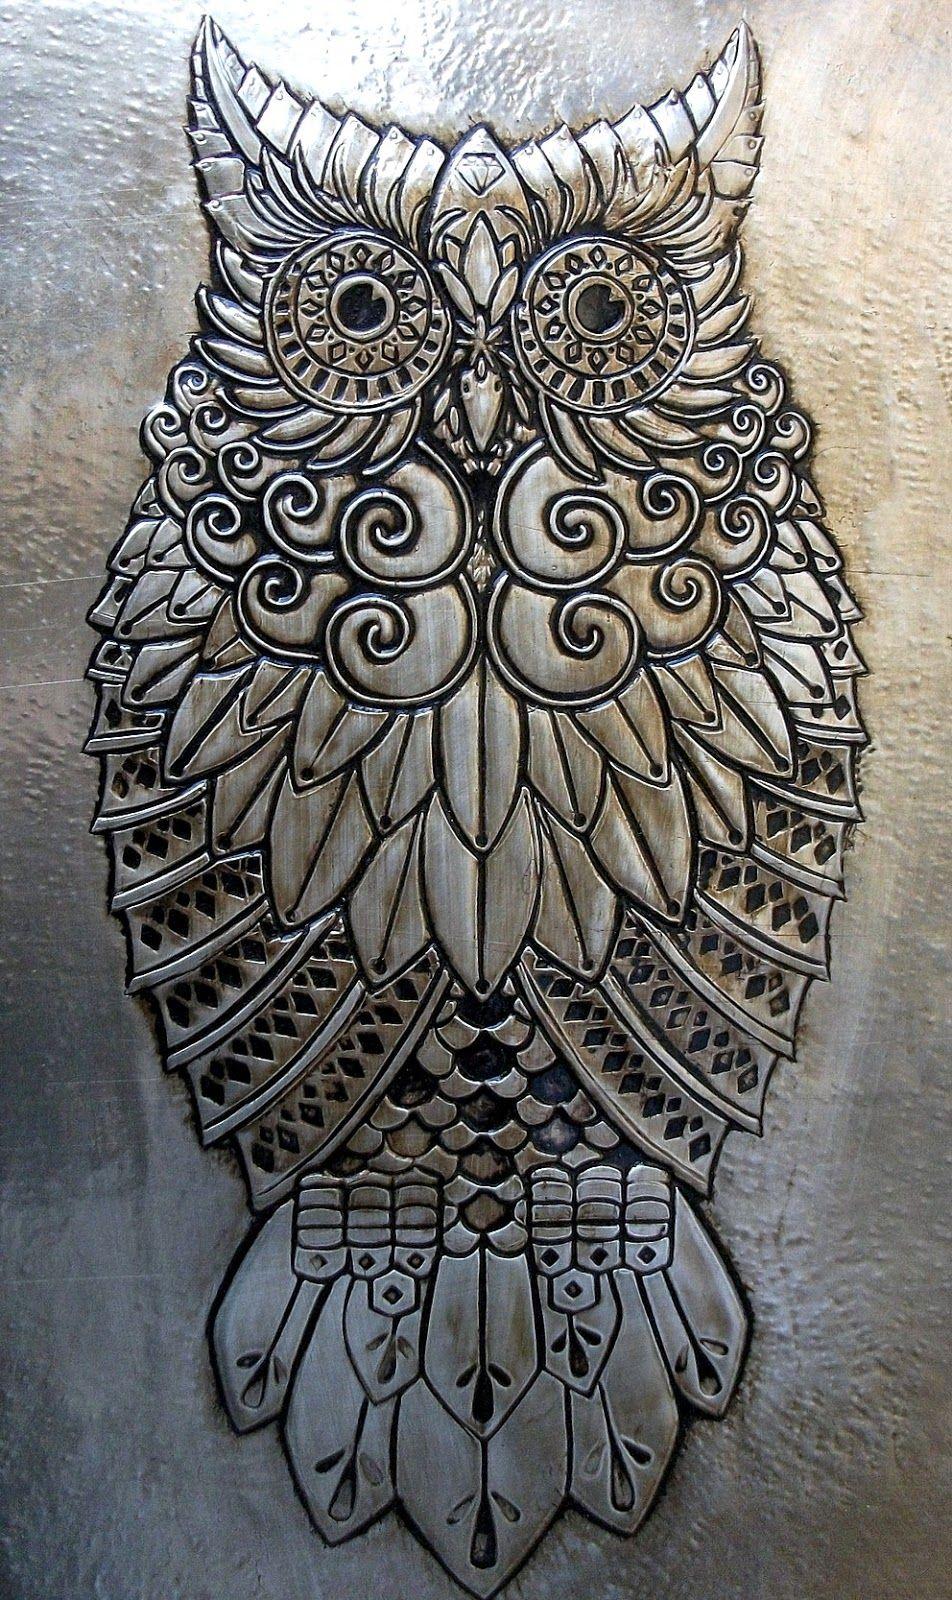 Desenho Para Latonagem Pesquisa Google Aluminum Foil Art Metal Embossing Art Tin Foil Art